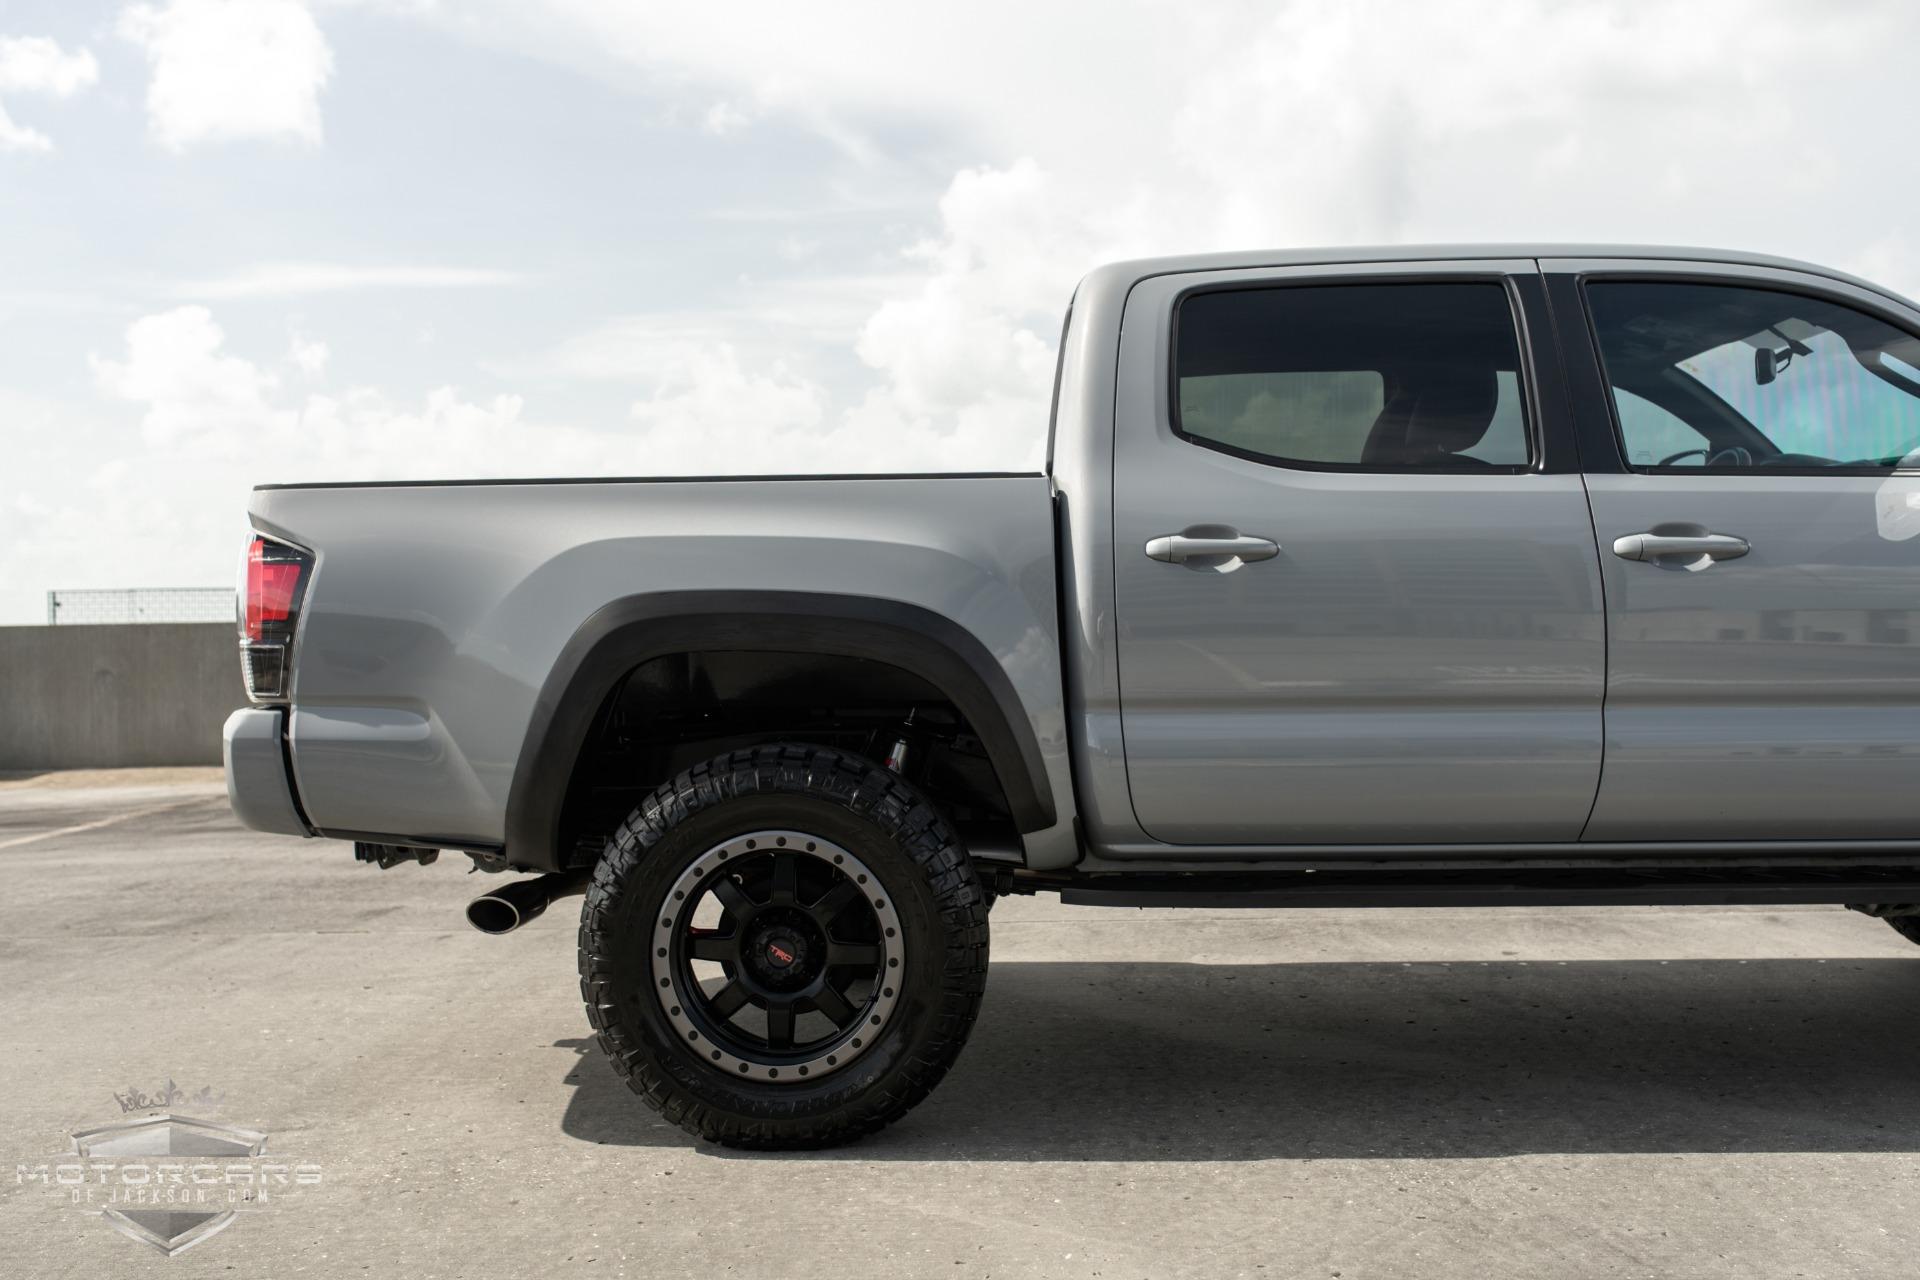 Used-2017-Toyota-Tacoma-TRD-Pro-Jackson-MS